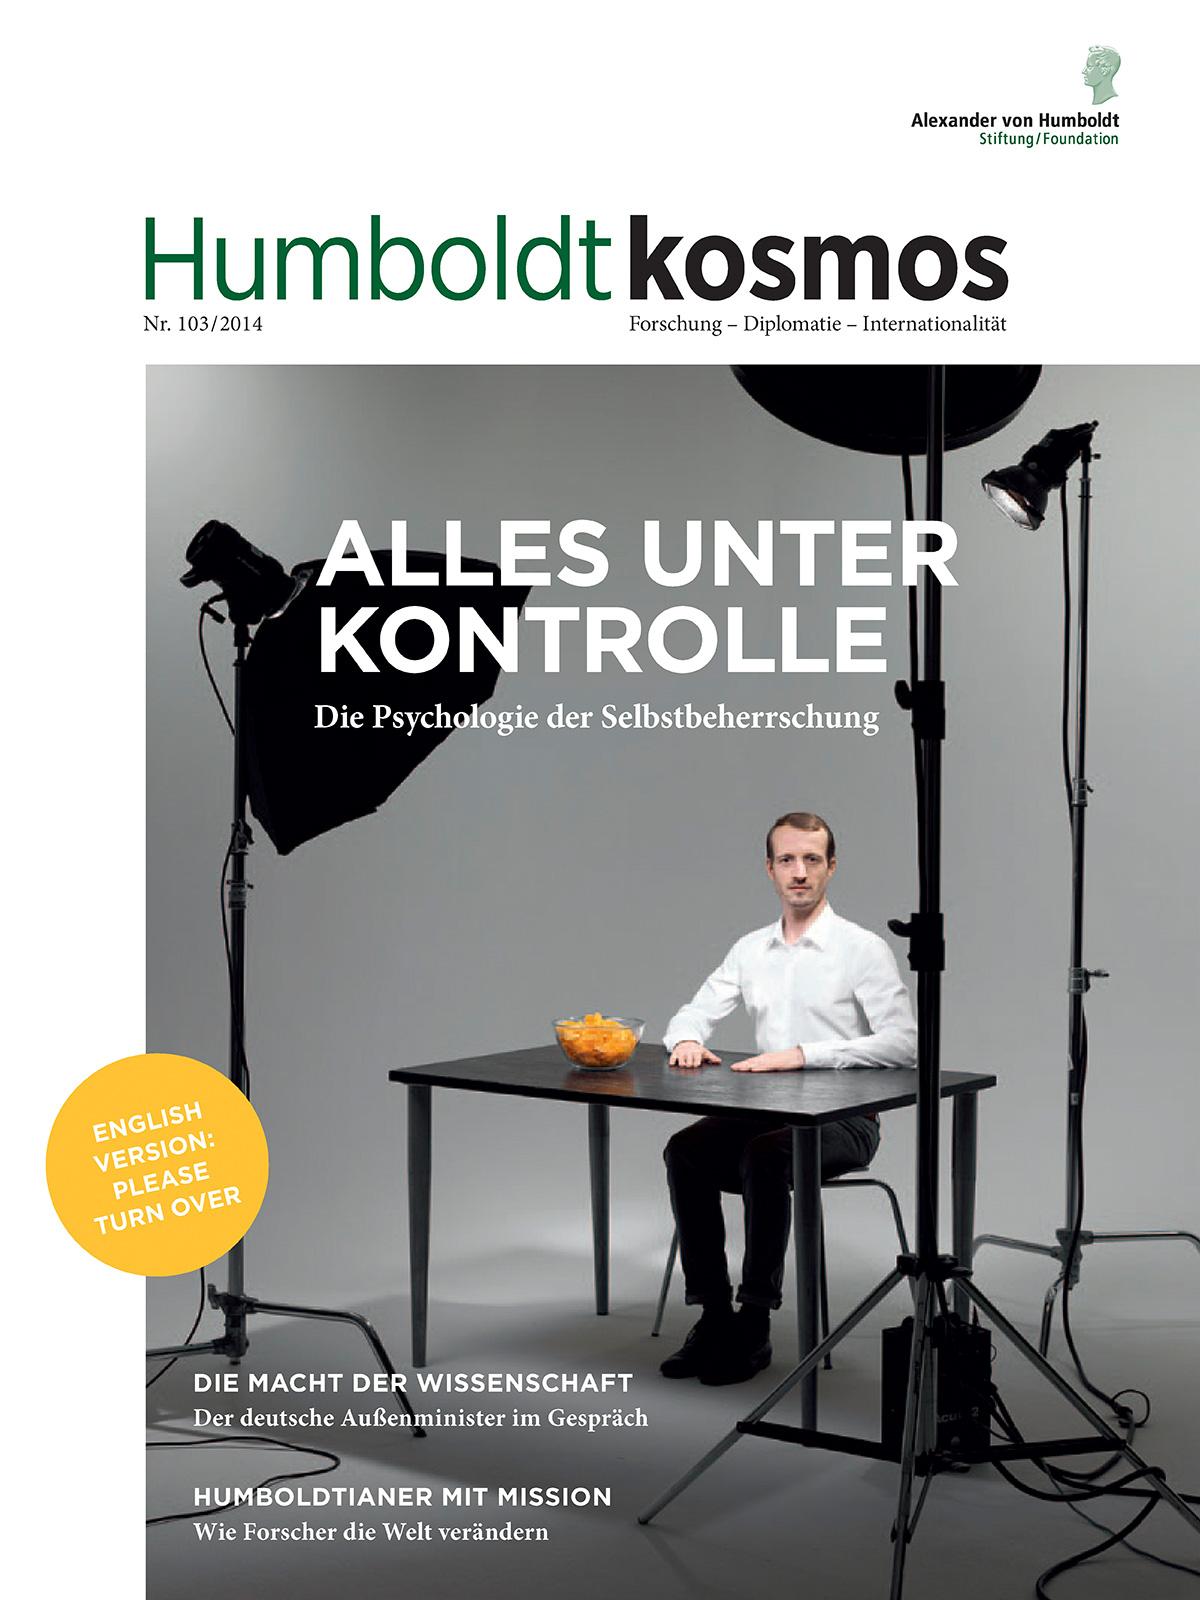 Cover 103/2014 by Nikolaus Brade.